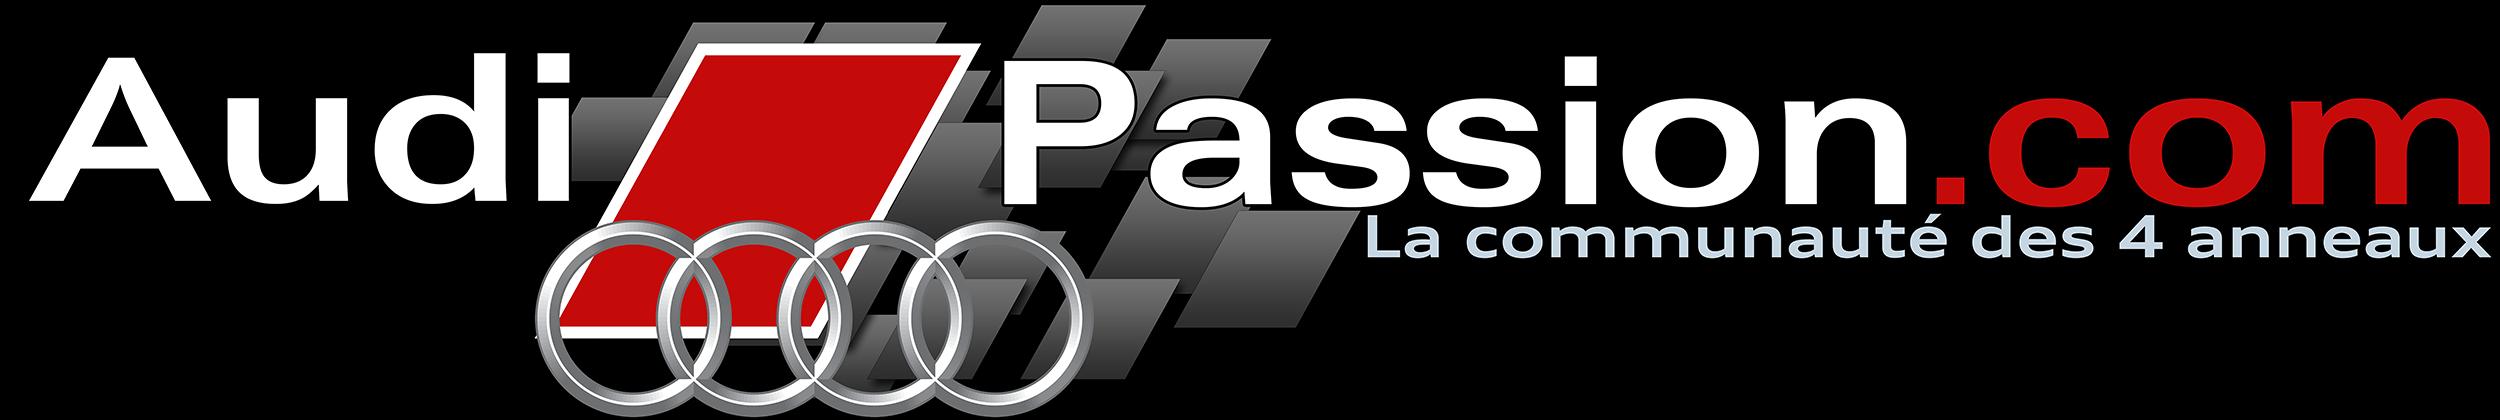 AP_Logo-Stickers_000_2500px_Noir_v2.png